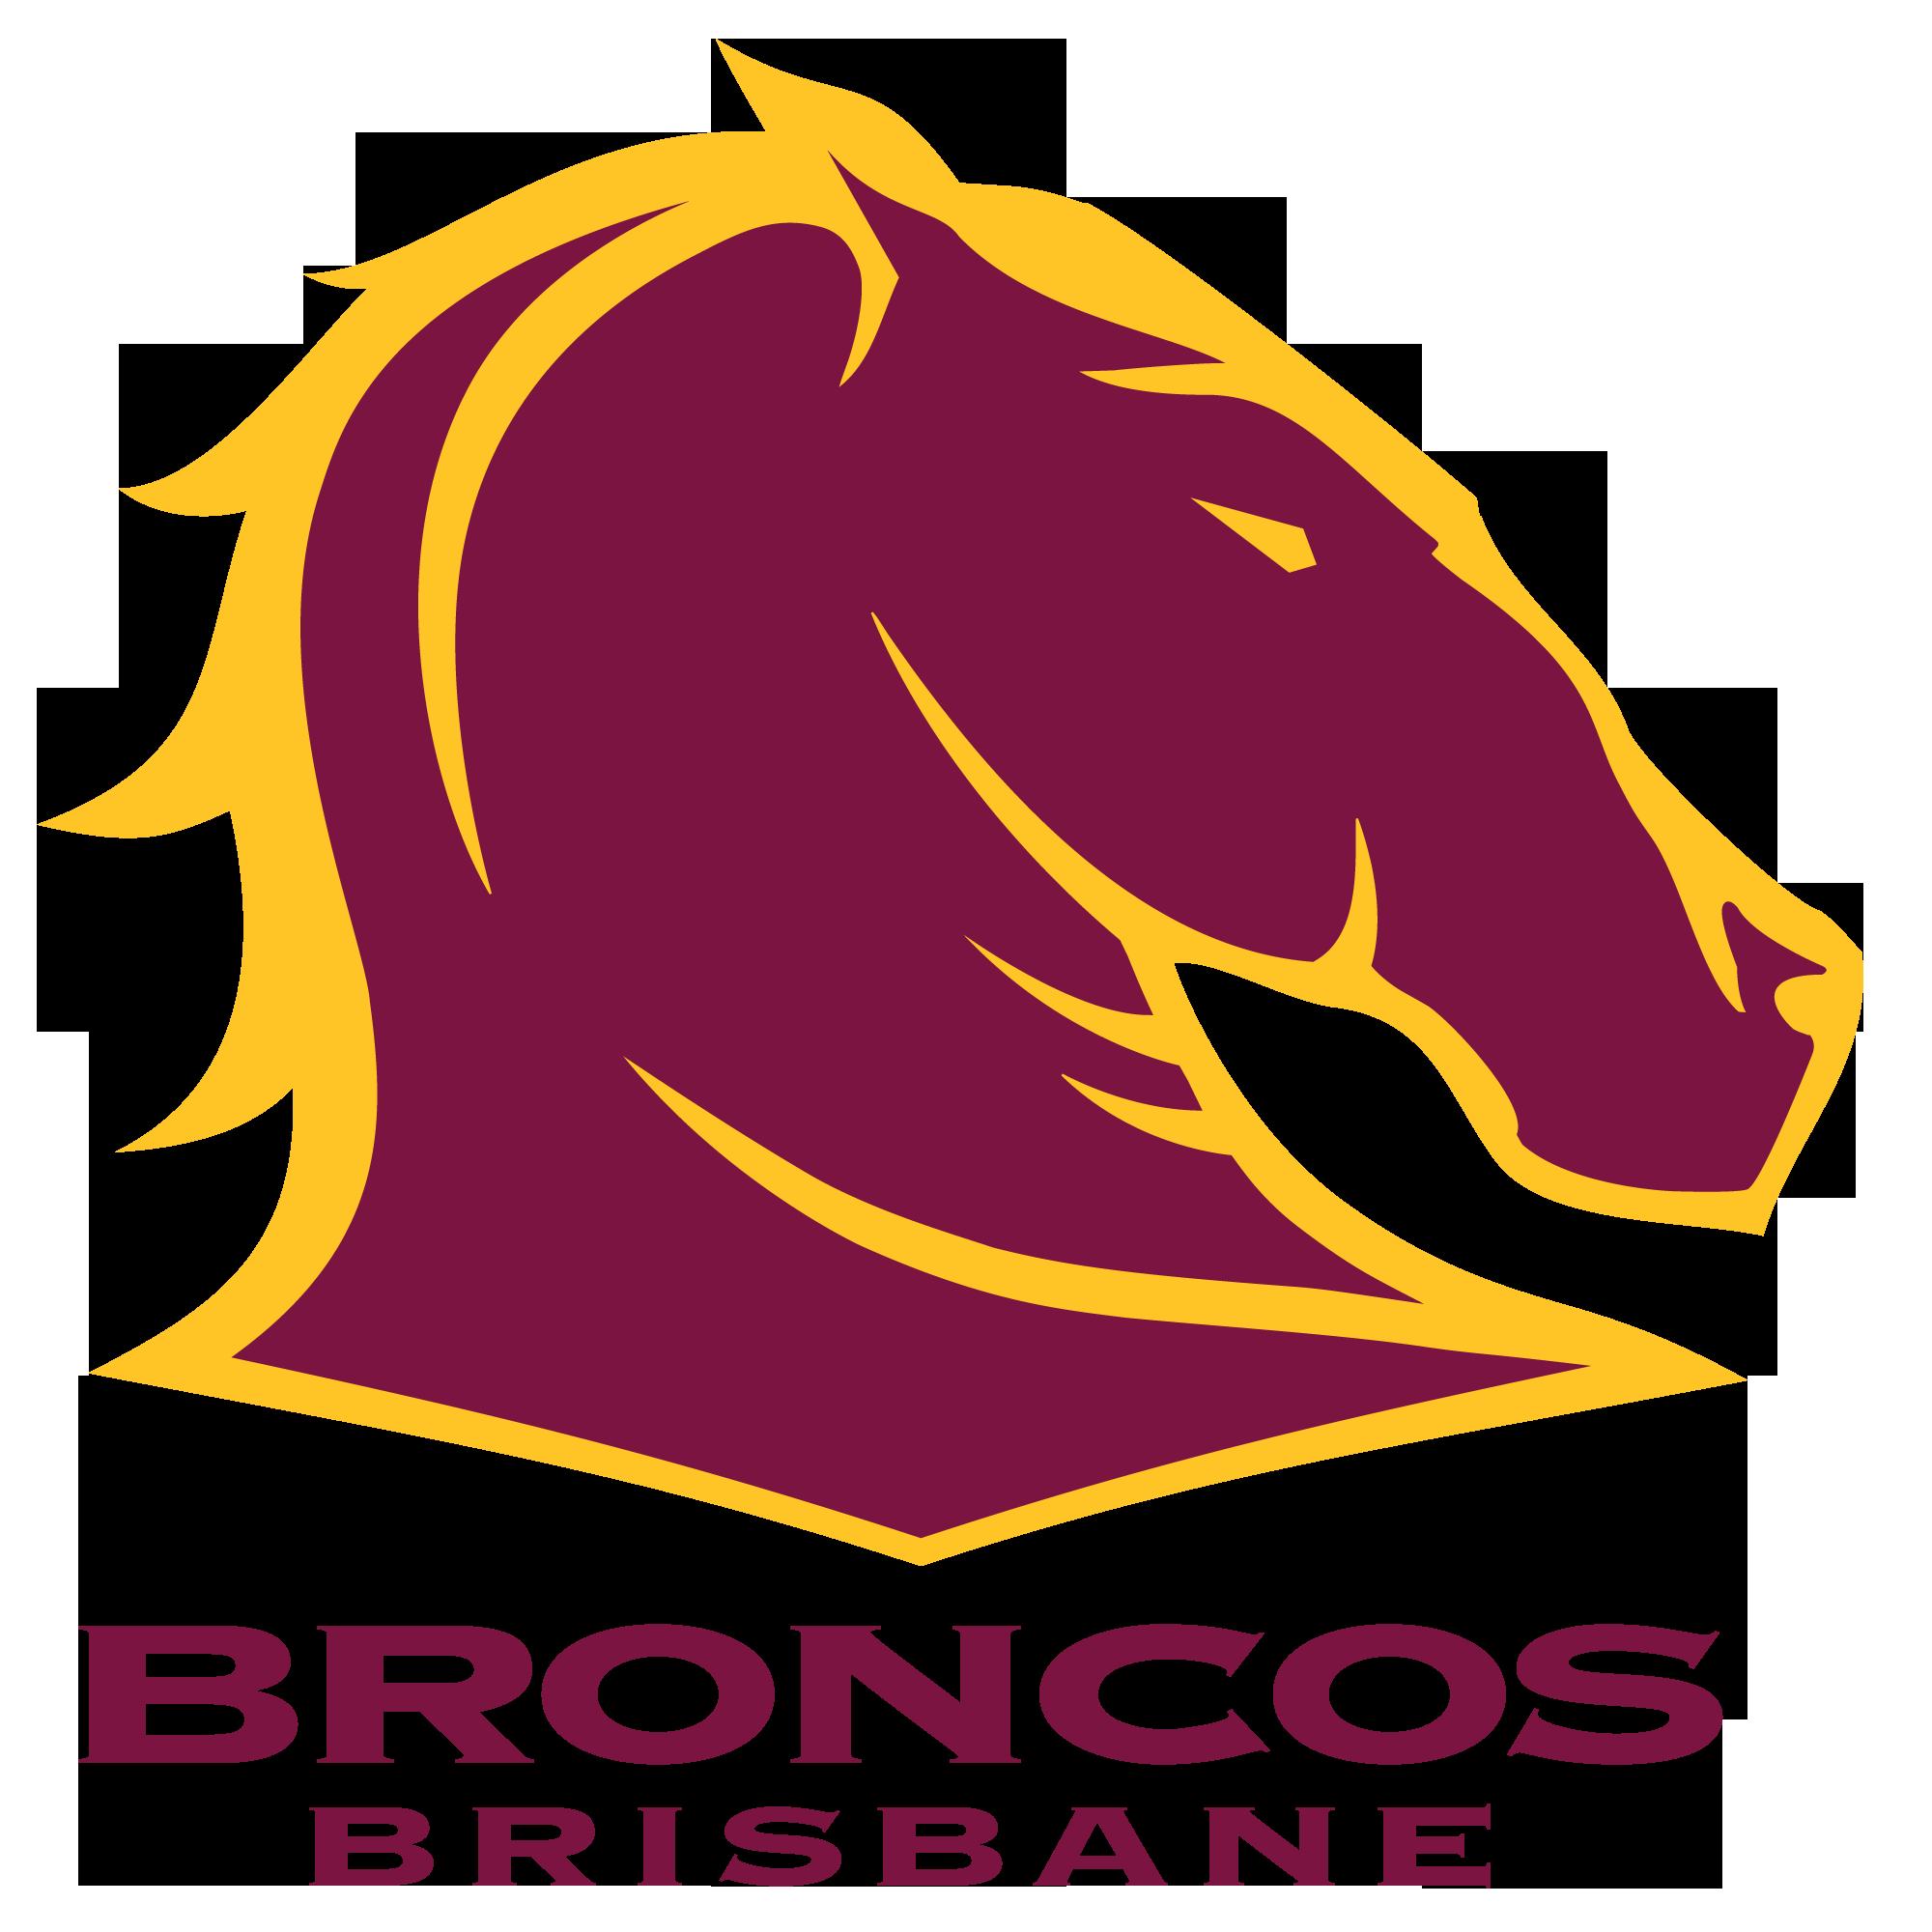 2014 brisbane broncos season preview  u00bb league unlimited cowboys logo images that just say cowboys cowboys logo image id